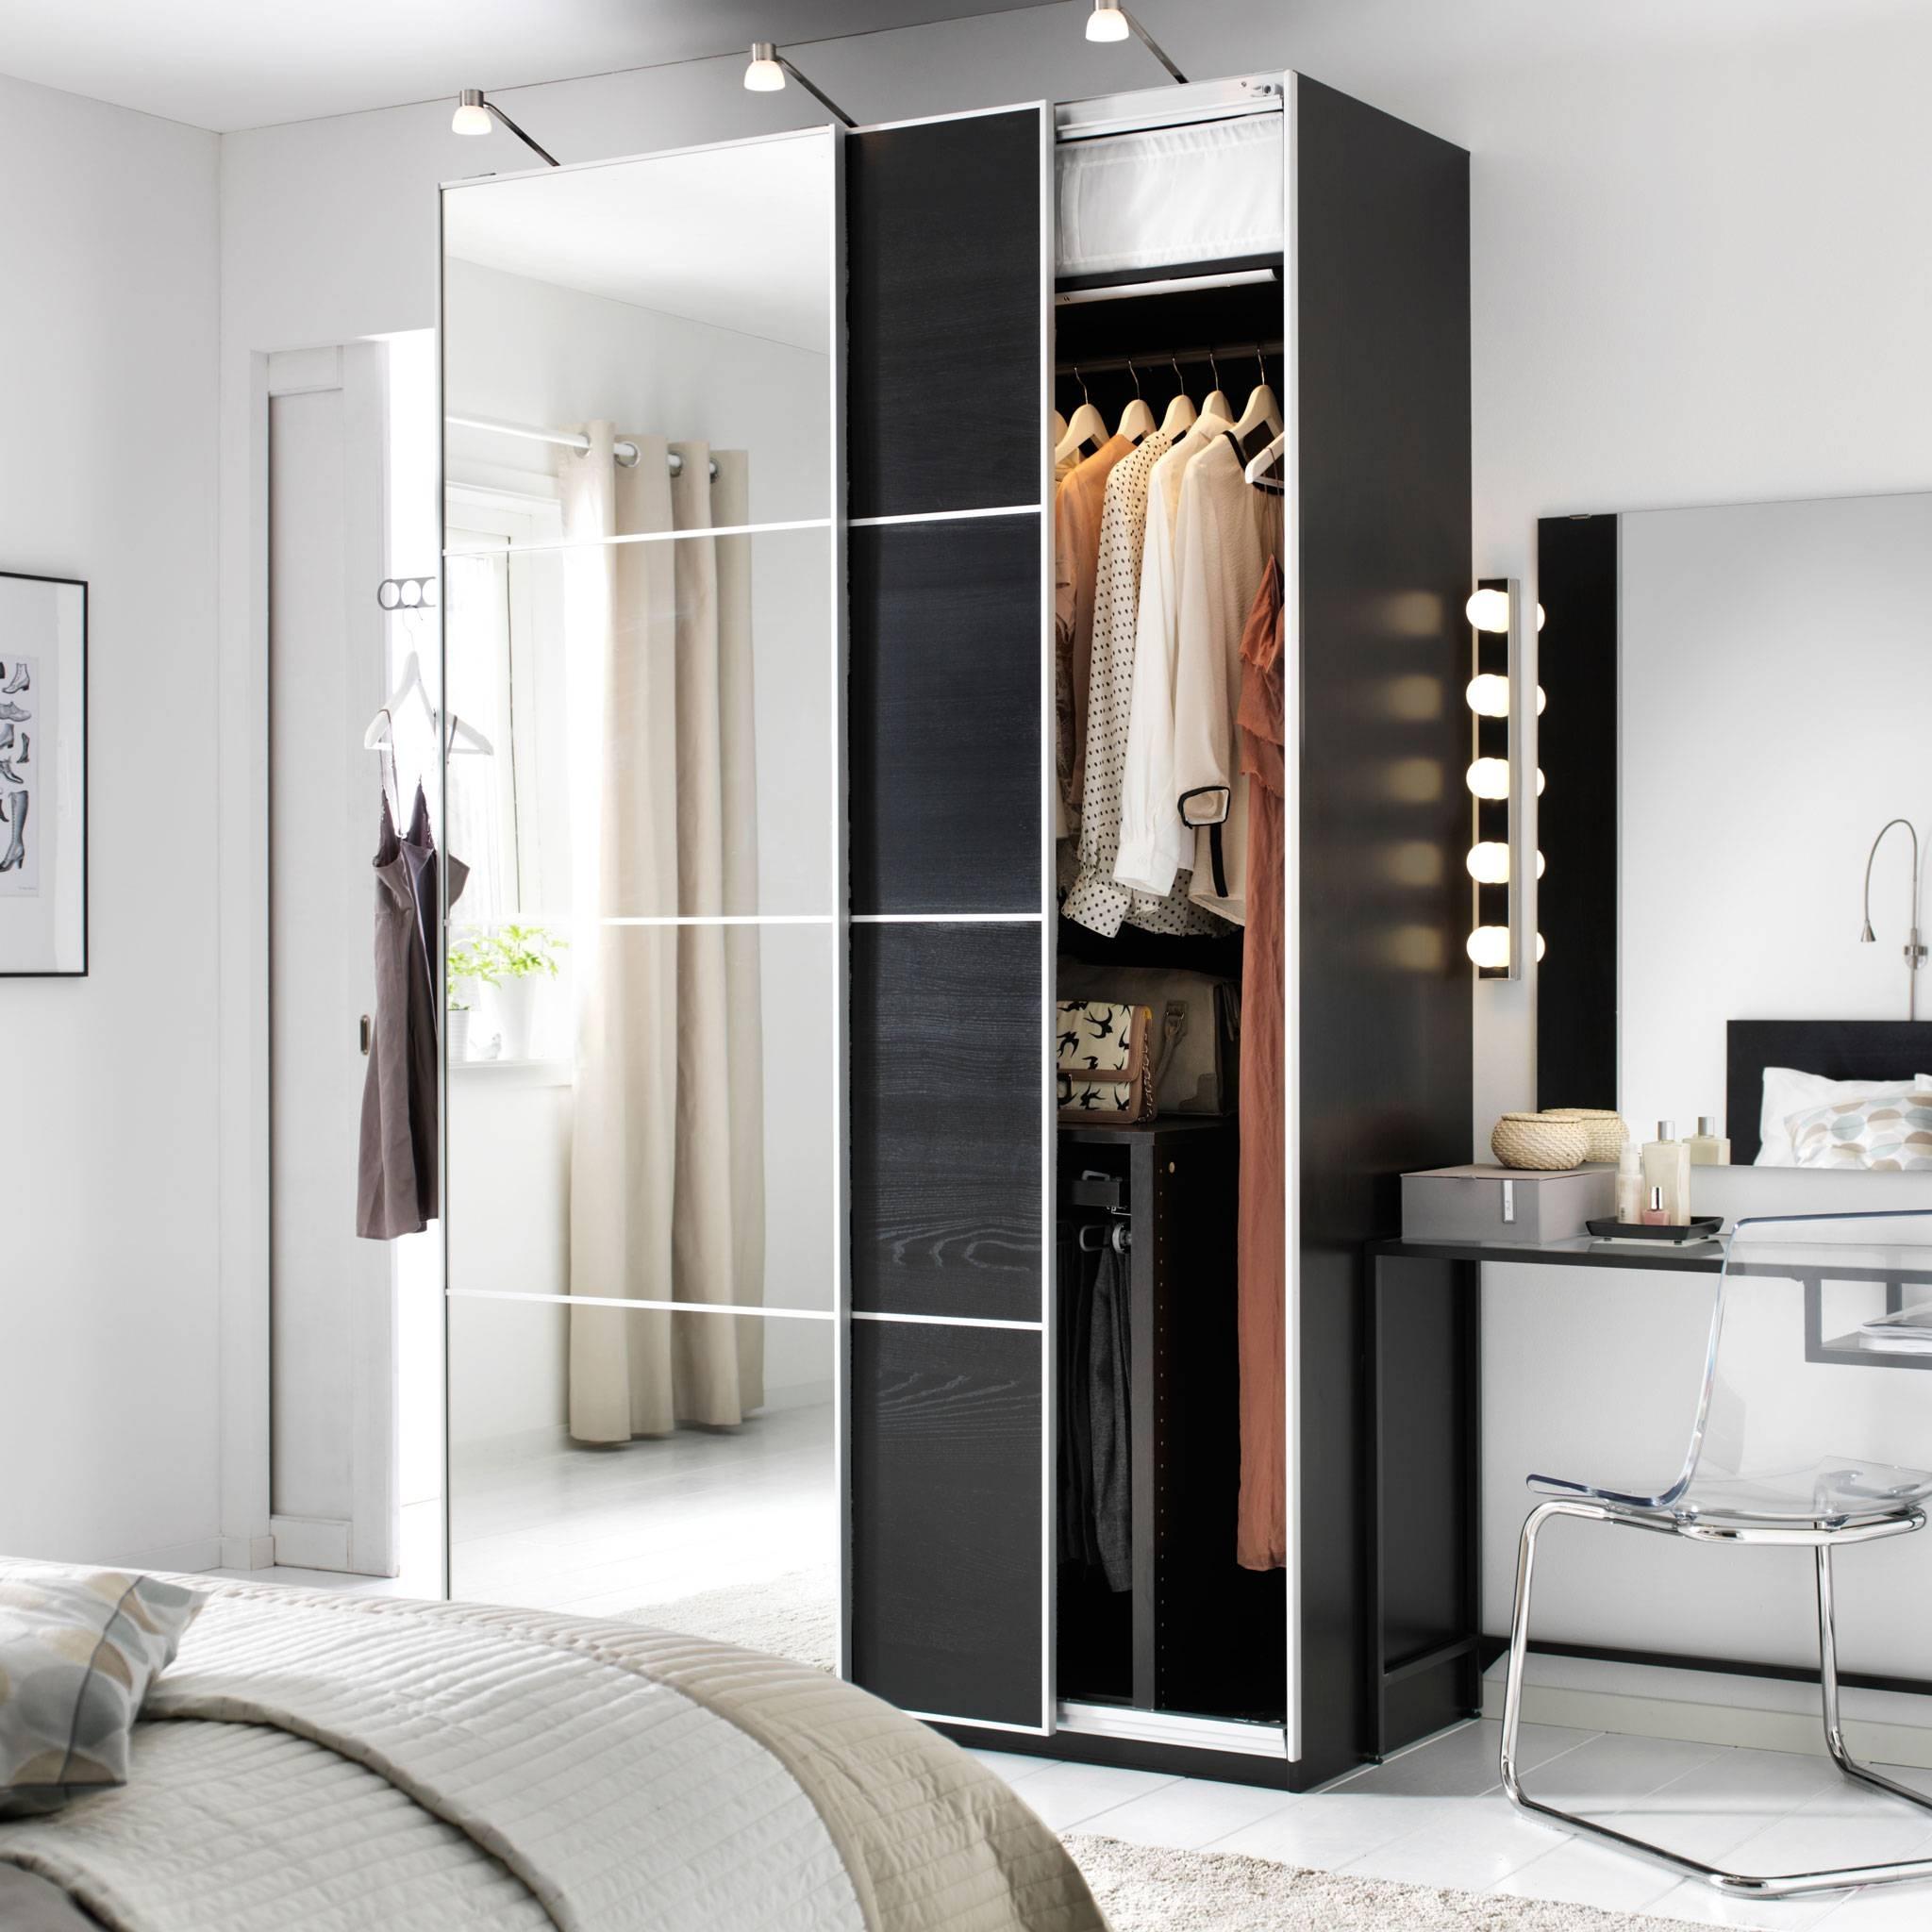 Bedroom Furniture & Ideas | Ikea within Dark Wood Wardrobe Doors (Image 3 of 30)